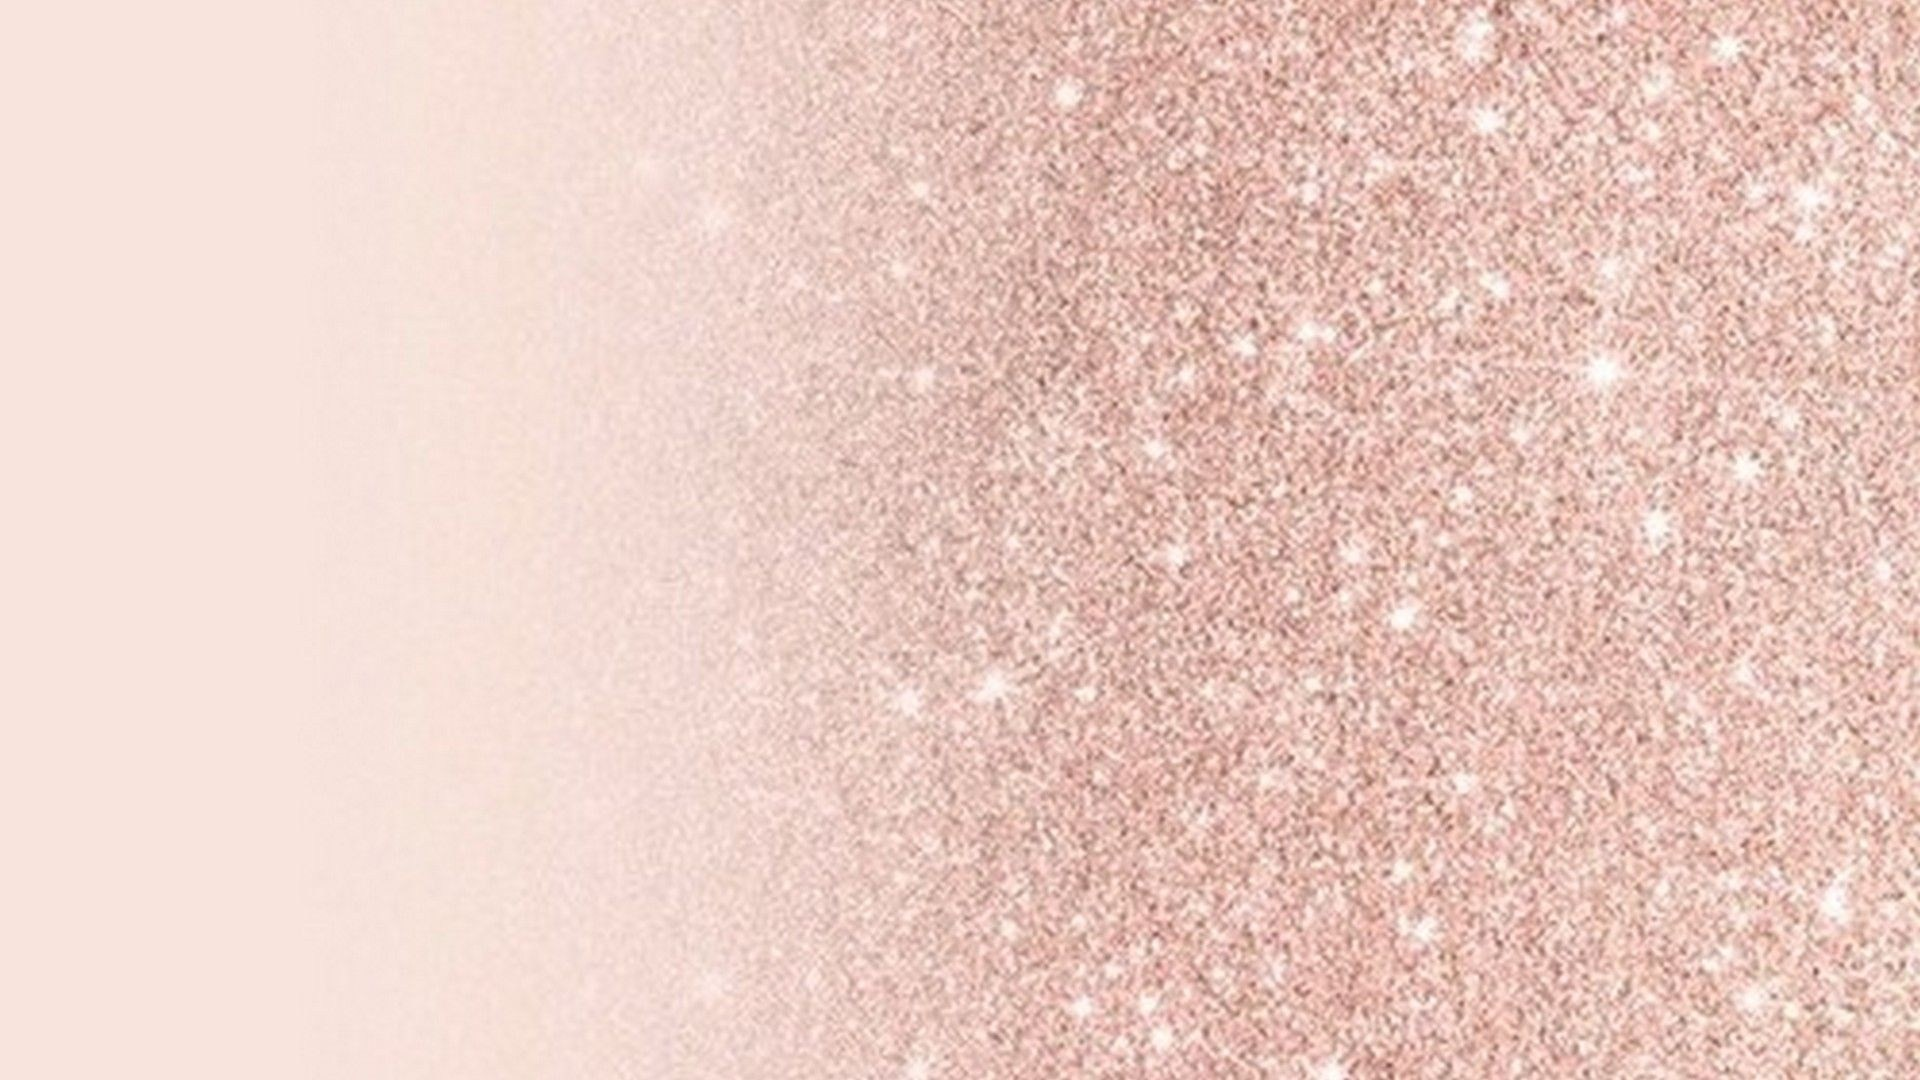 Pink Marble Desktop Wallpaper Hd Fitrini S Wallpaper